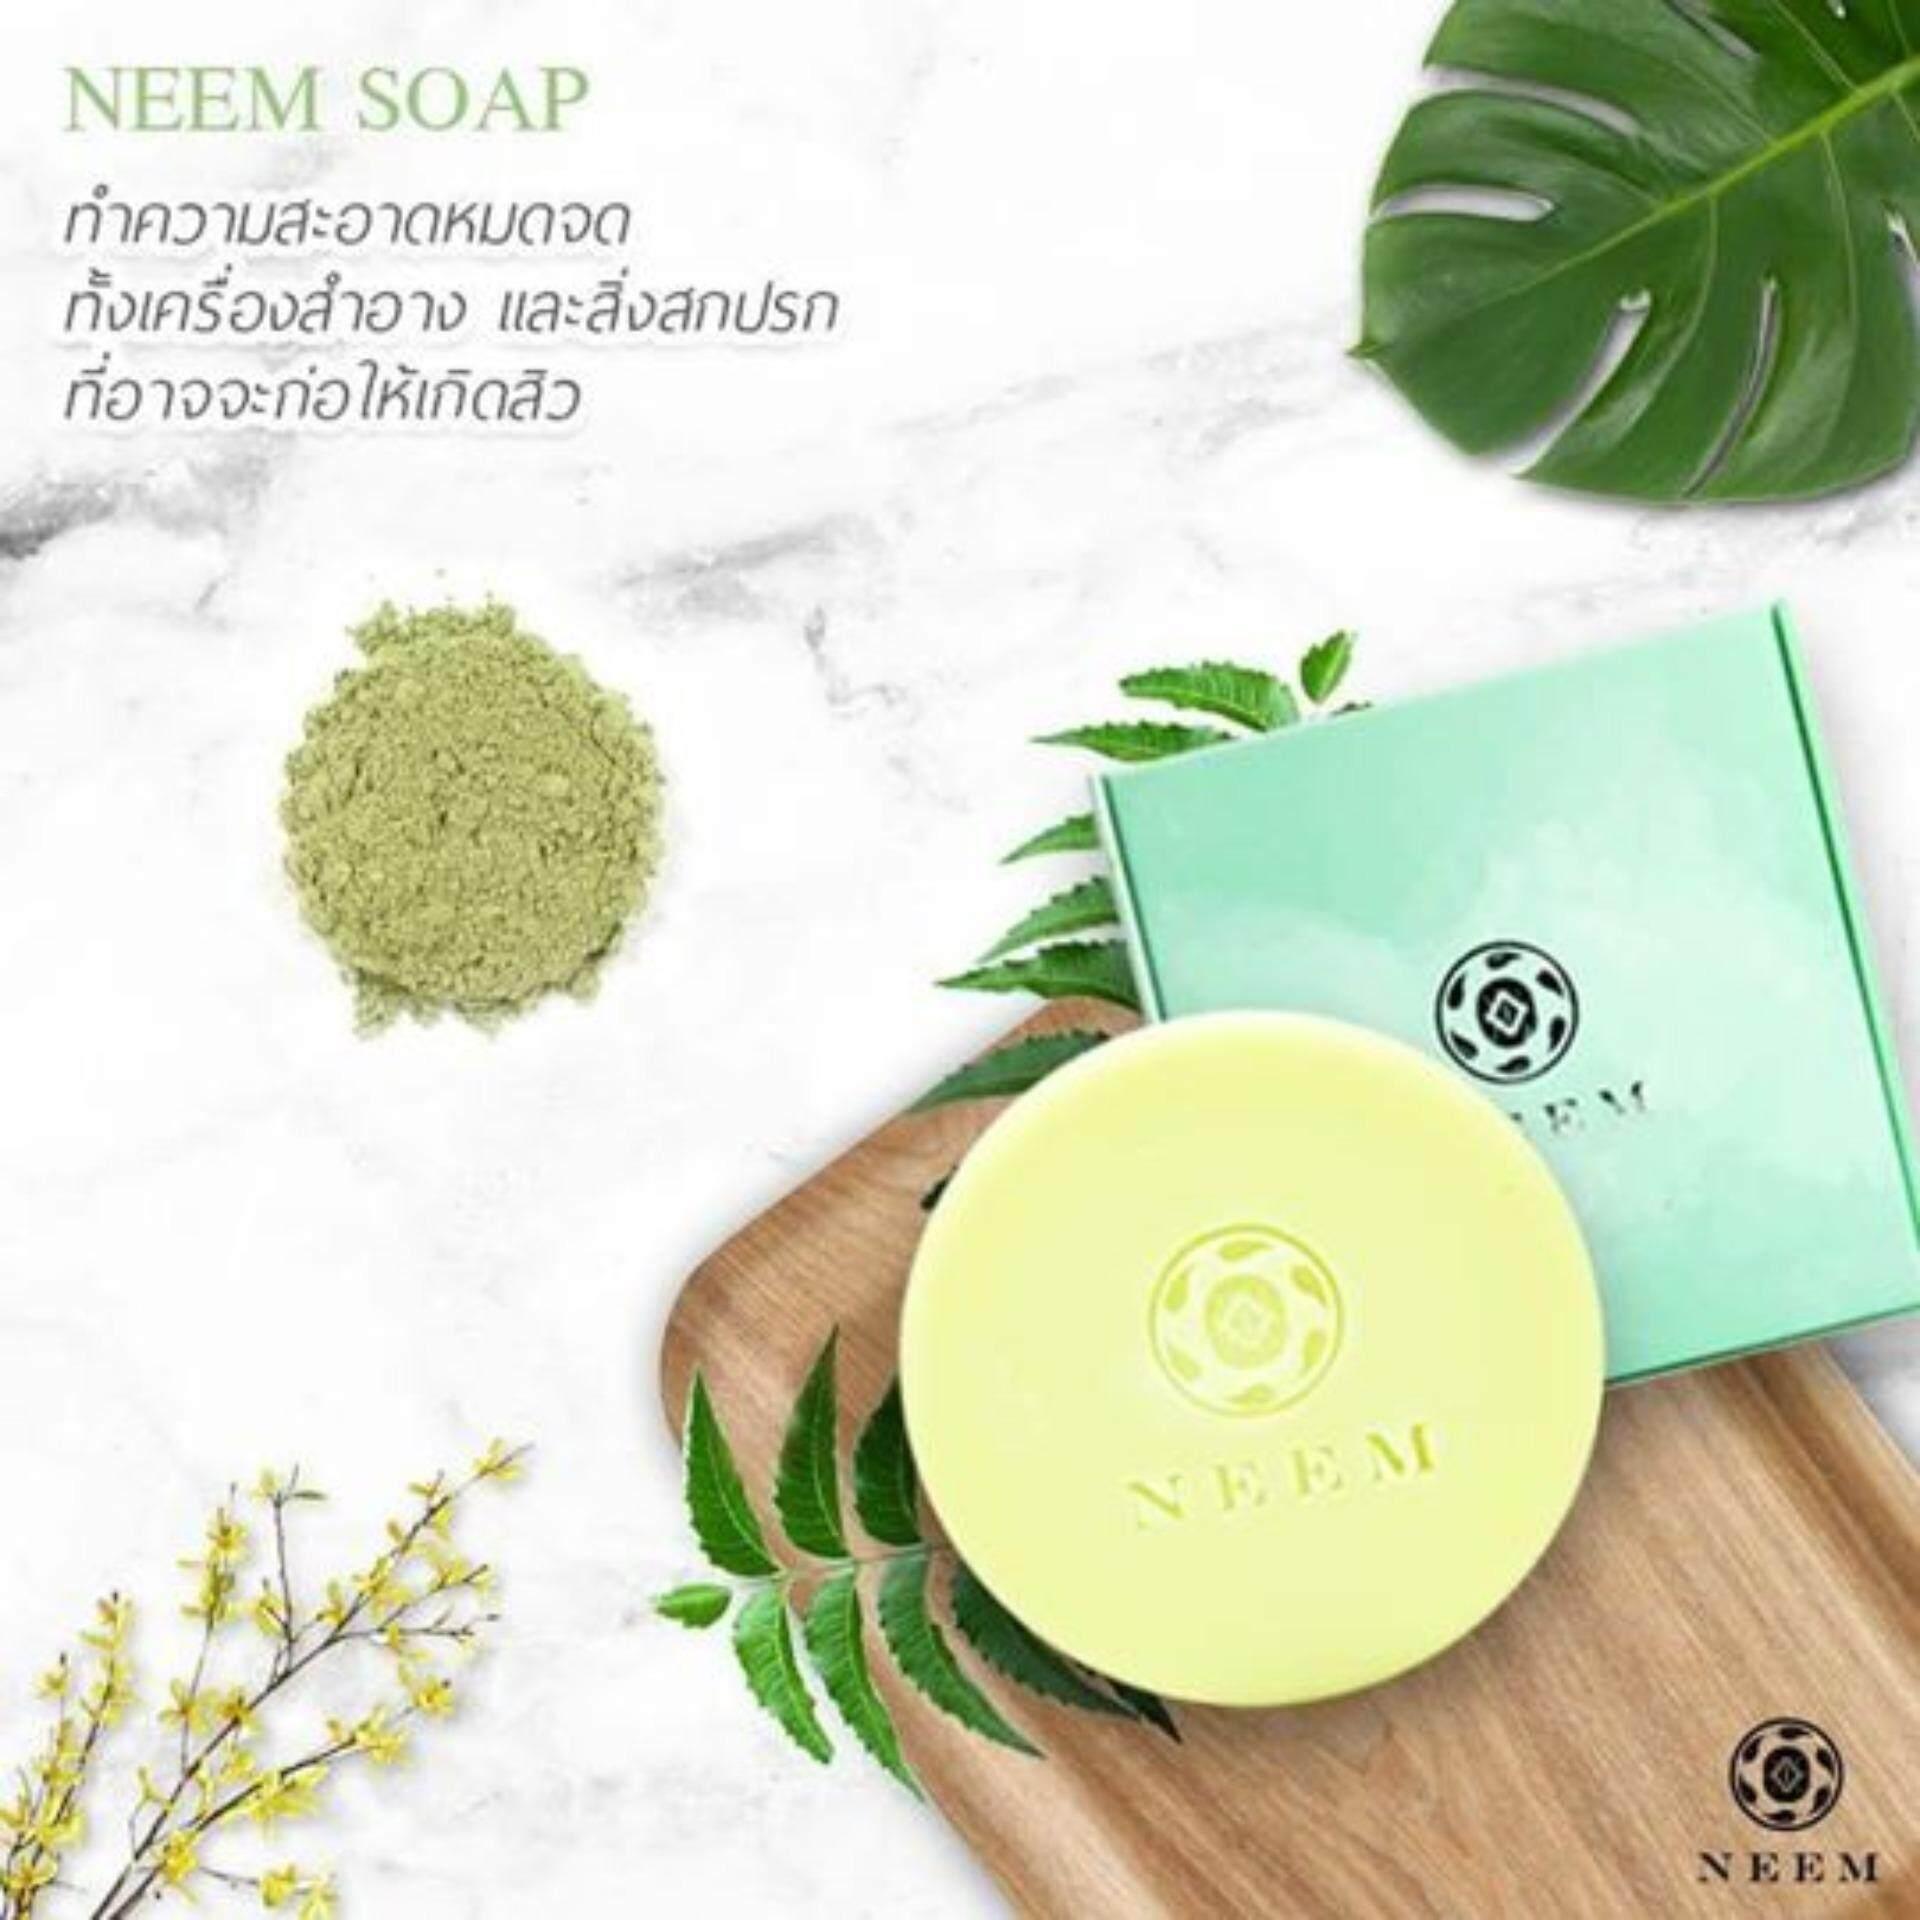 NEEM BRIGHT & CLEAR ACNE SOAP 25g. และ 50g. สบู่รักษาสิว ดีท๊อกซ์สาร ปรับผิวขาว